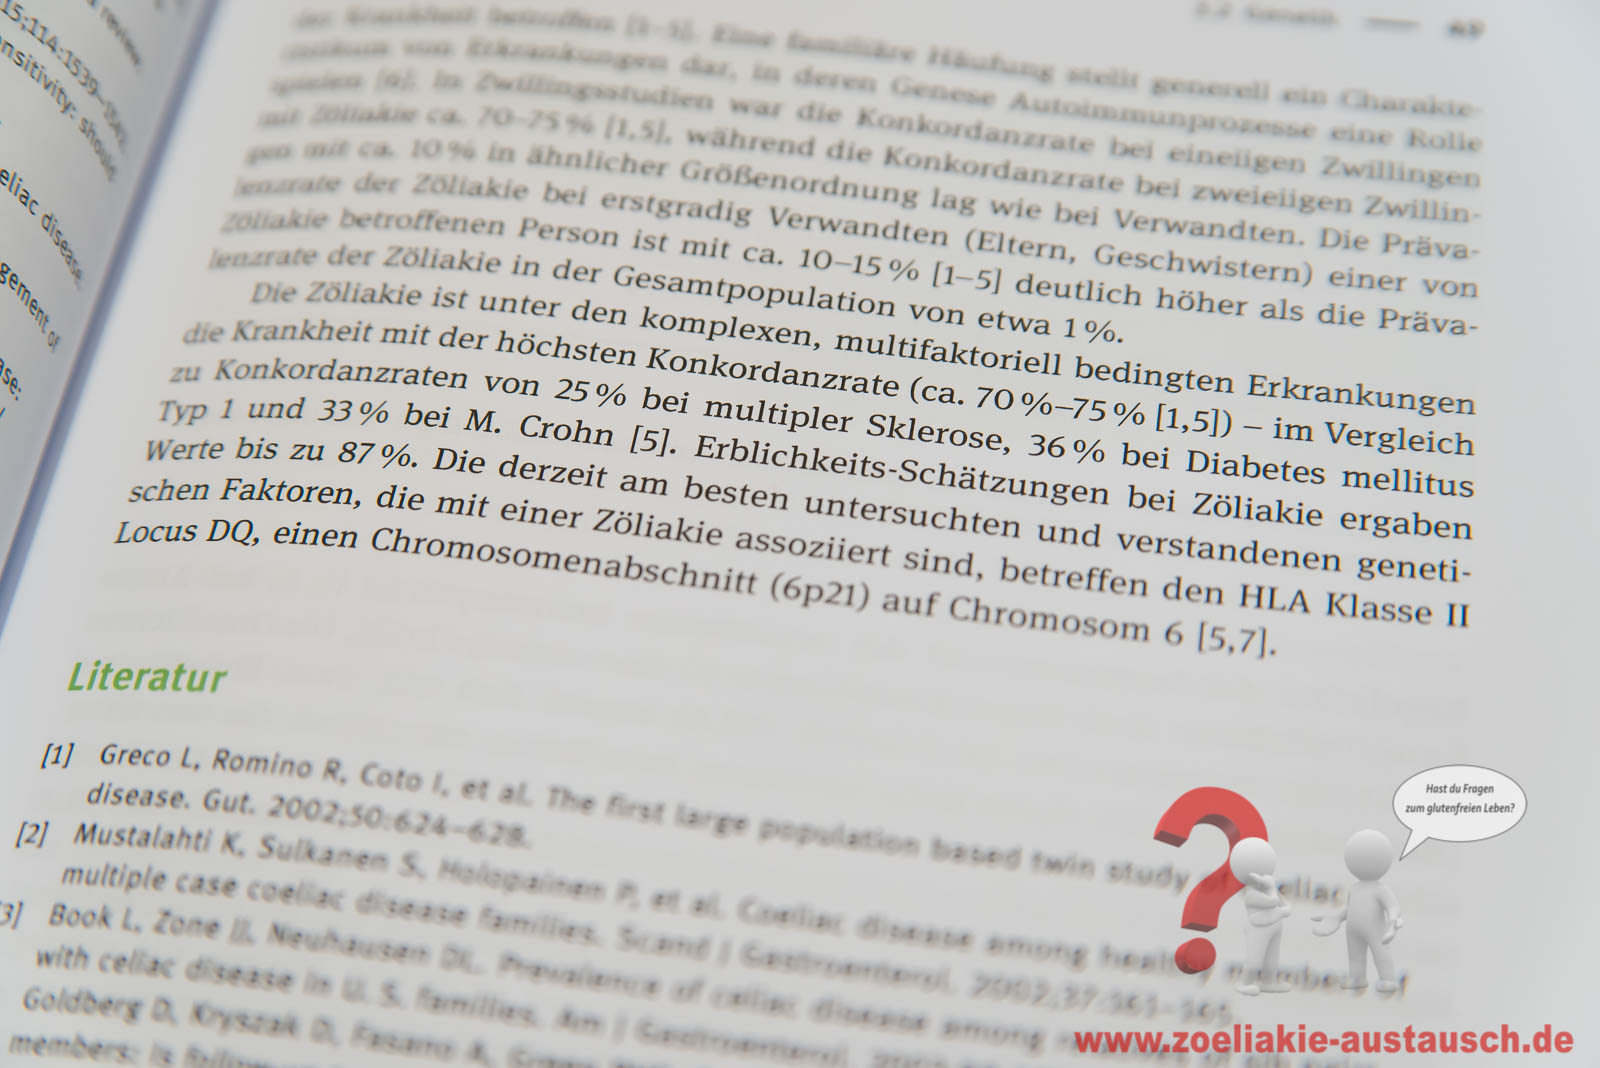 Gruyter-Leiss-Zoeliakie-20171224-JSC_4731